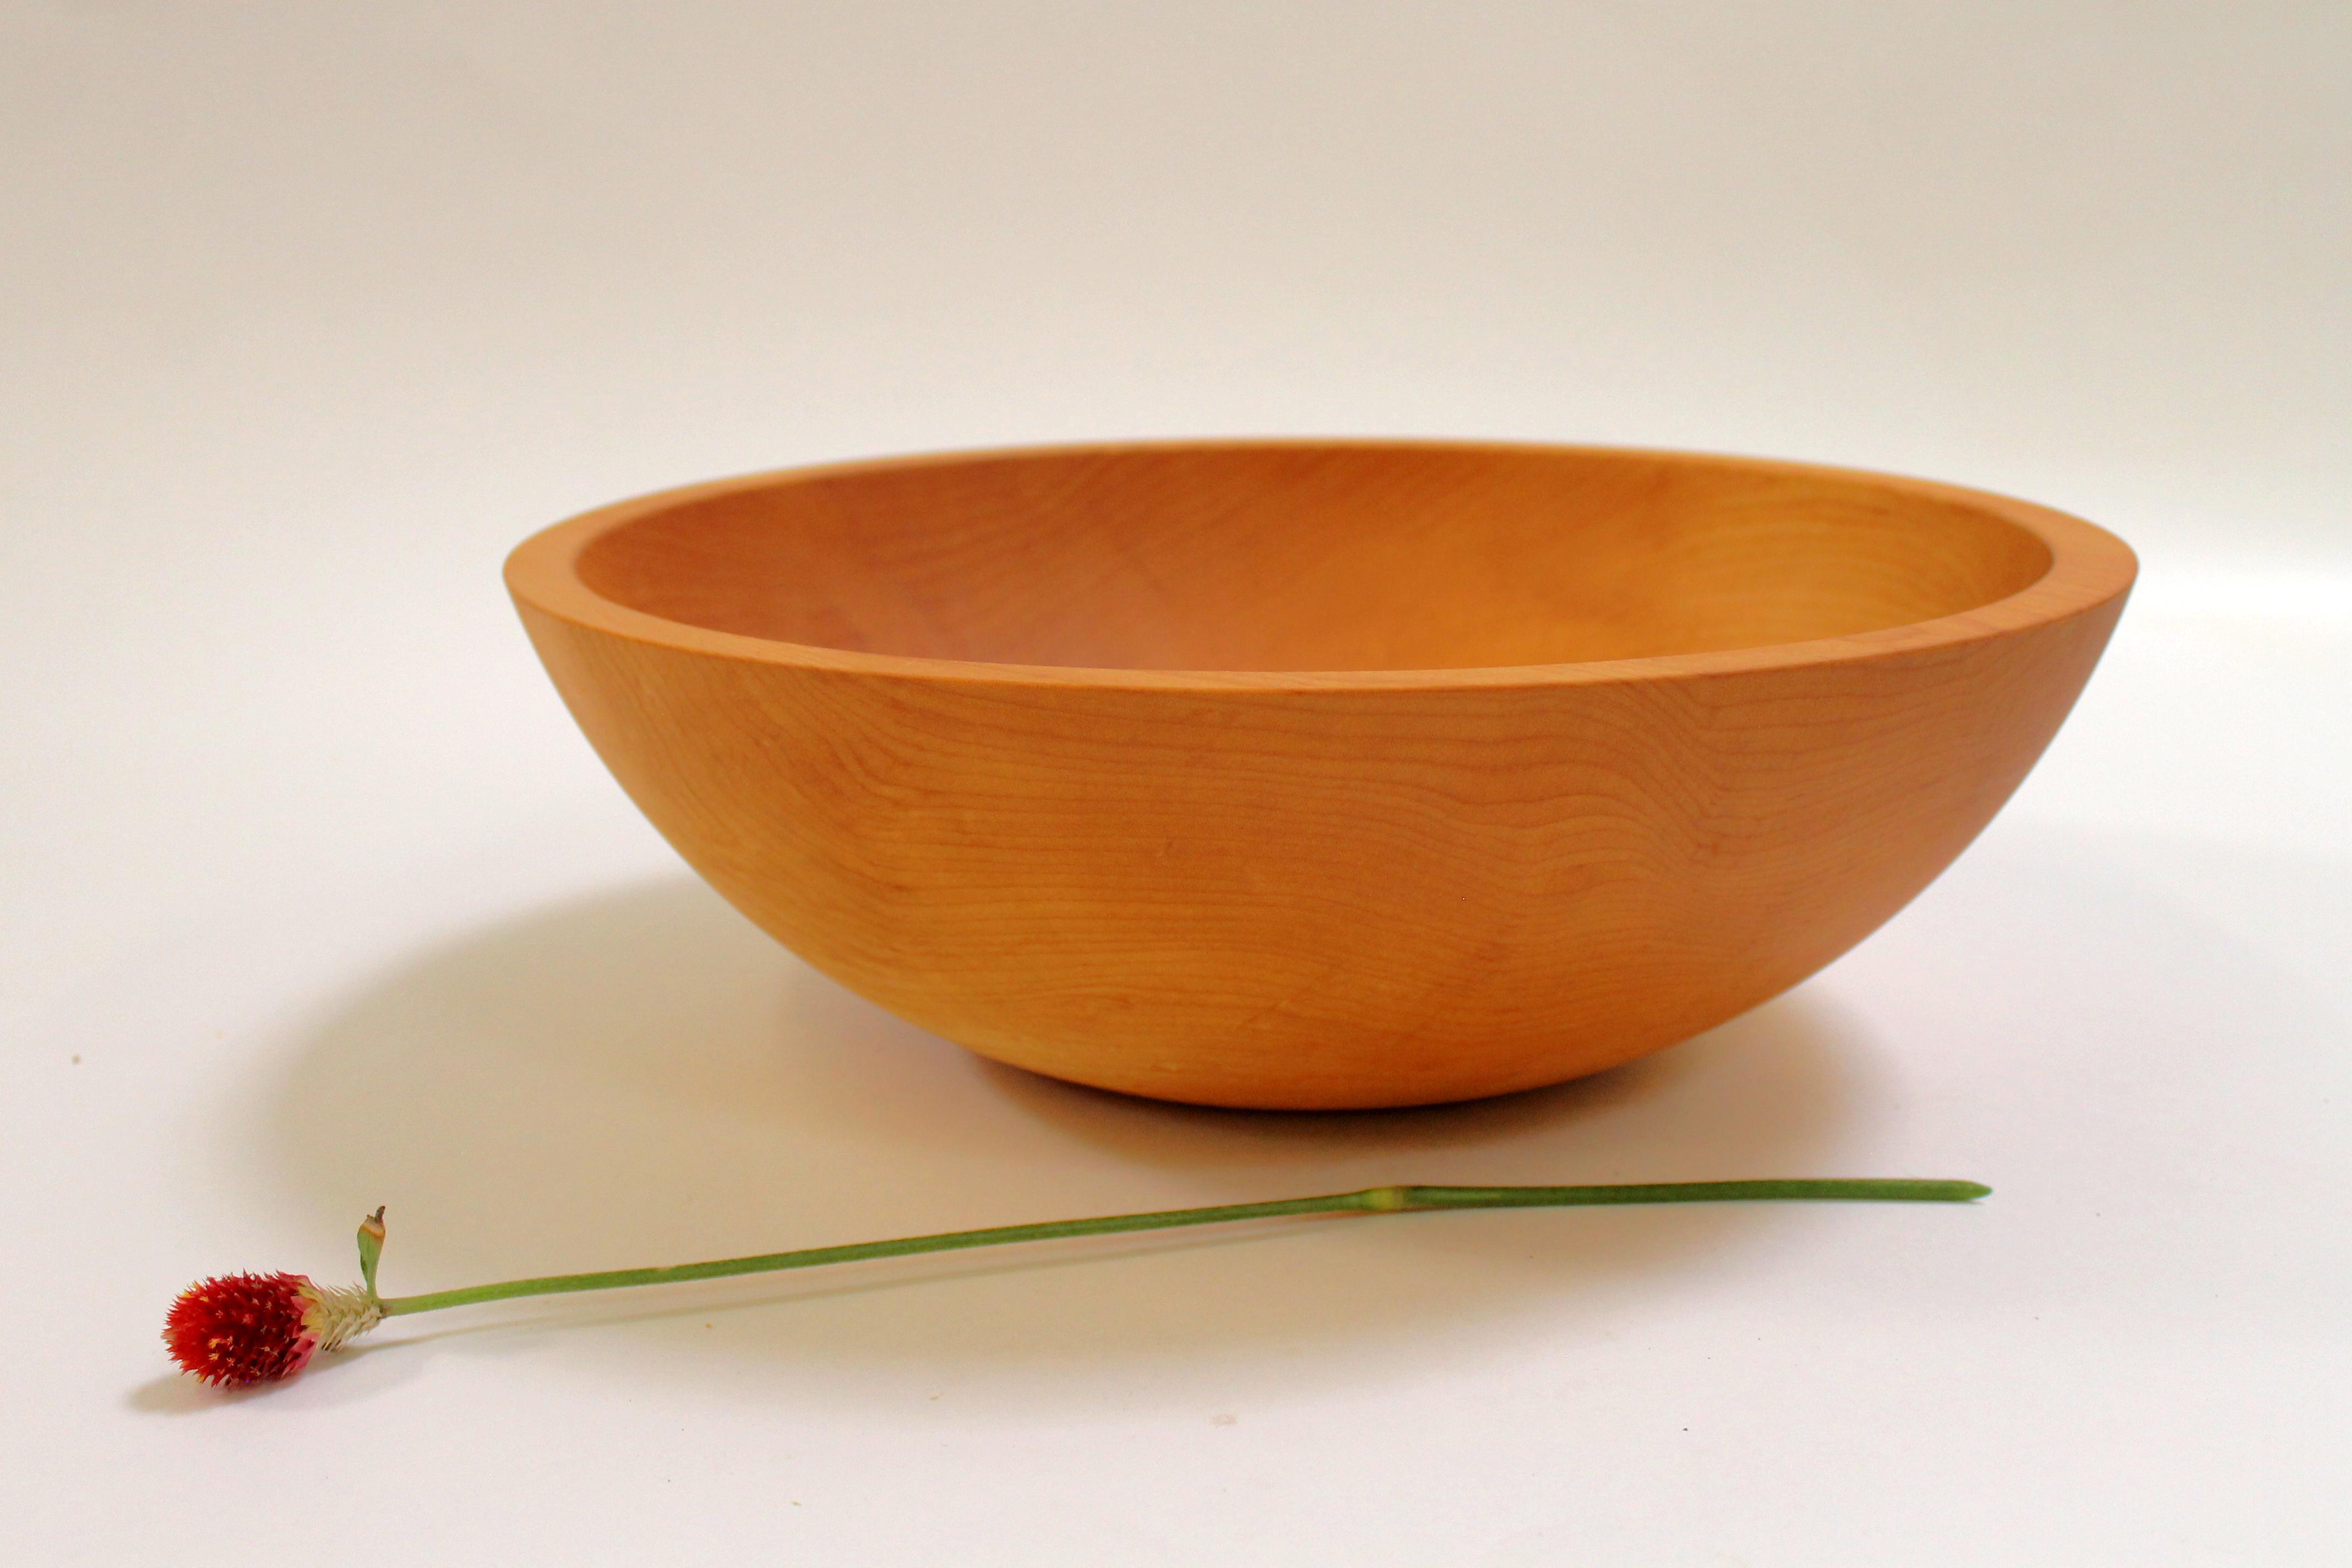 15 inch Hard Maple Bowl - Bee's Oil Finish M115B